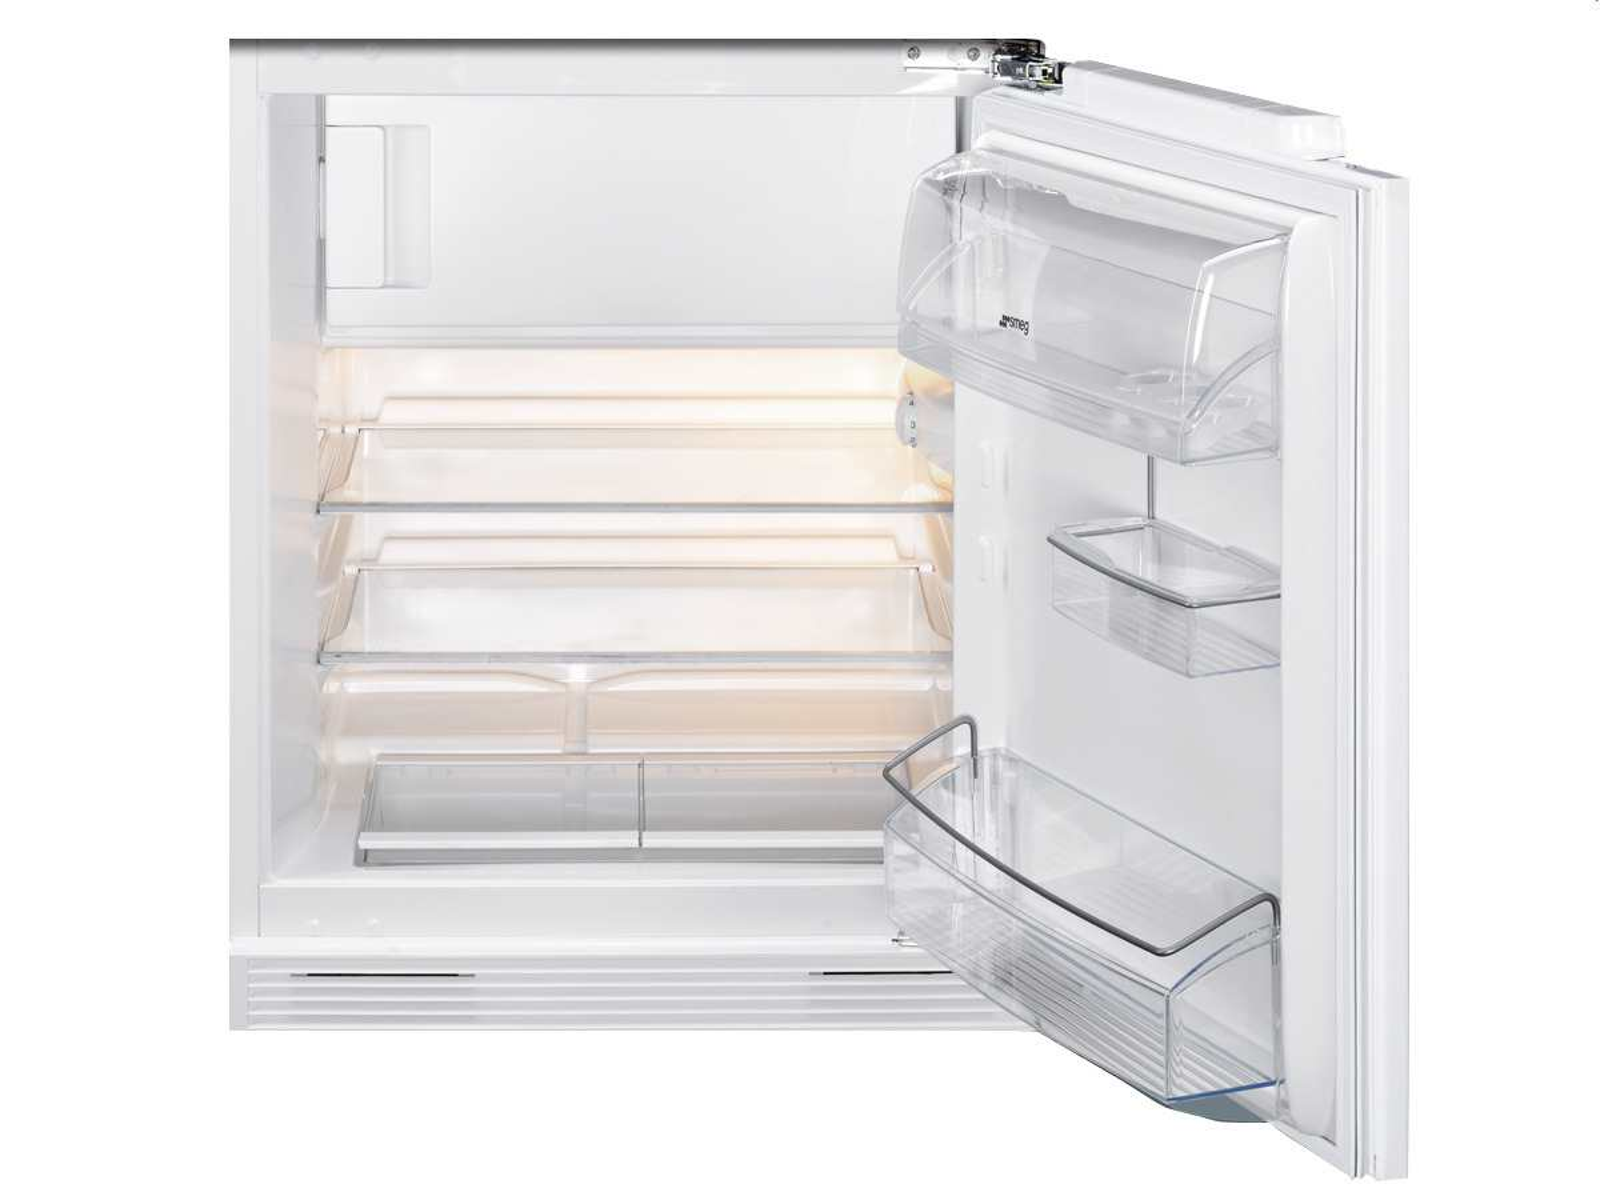 Smeg Kühlschrank Db : Smeg ud7122csp unterbaukühlschrank